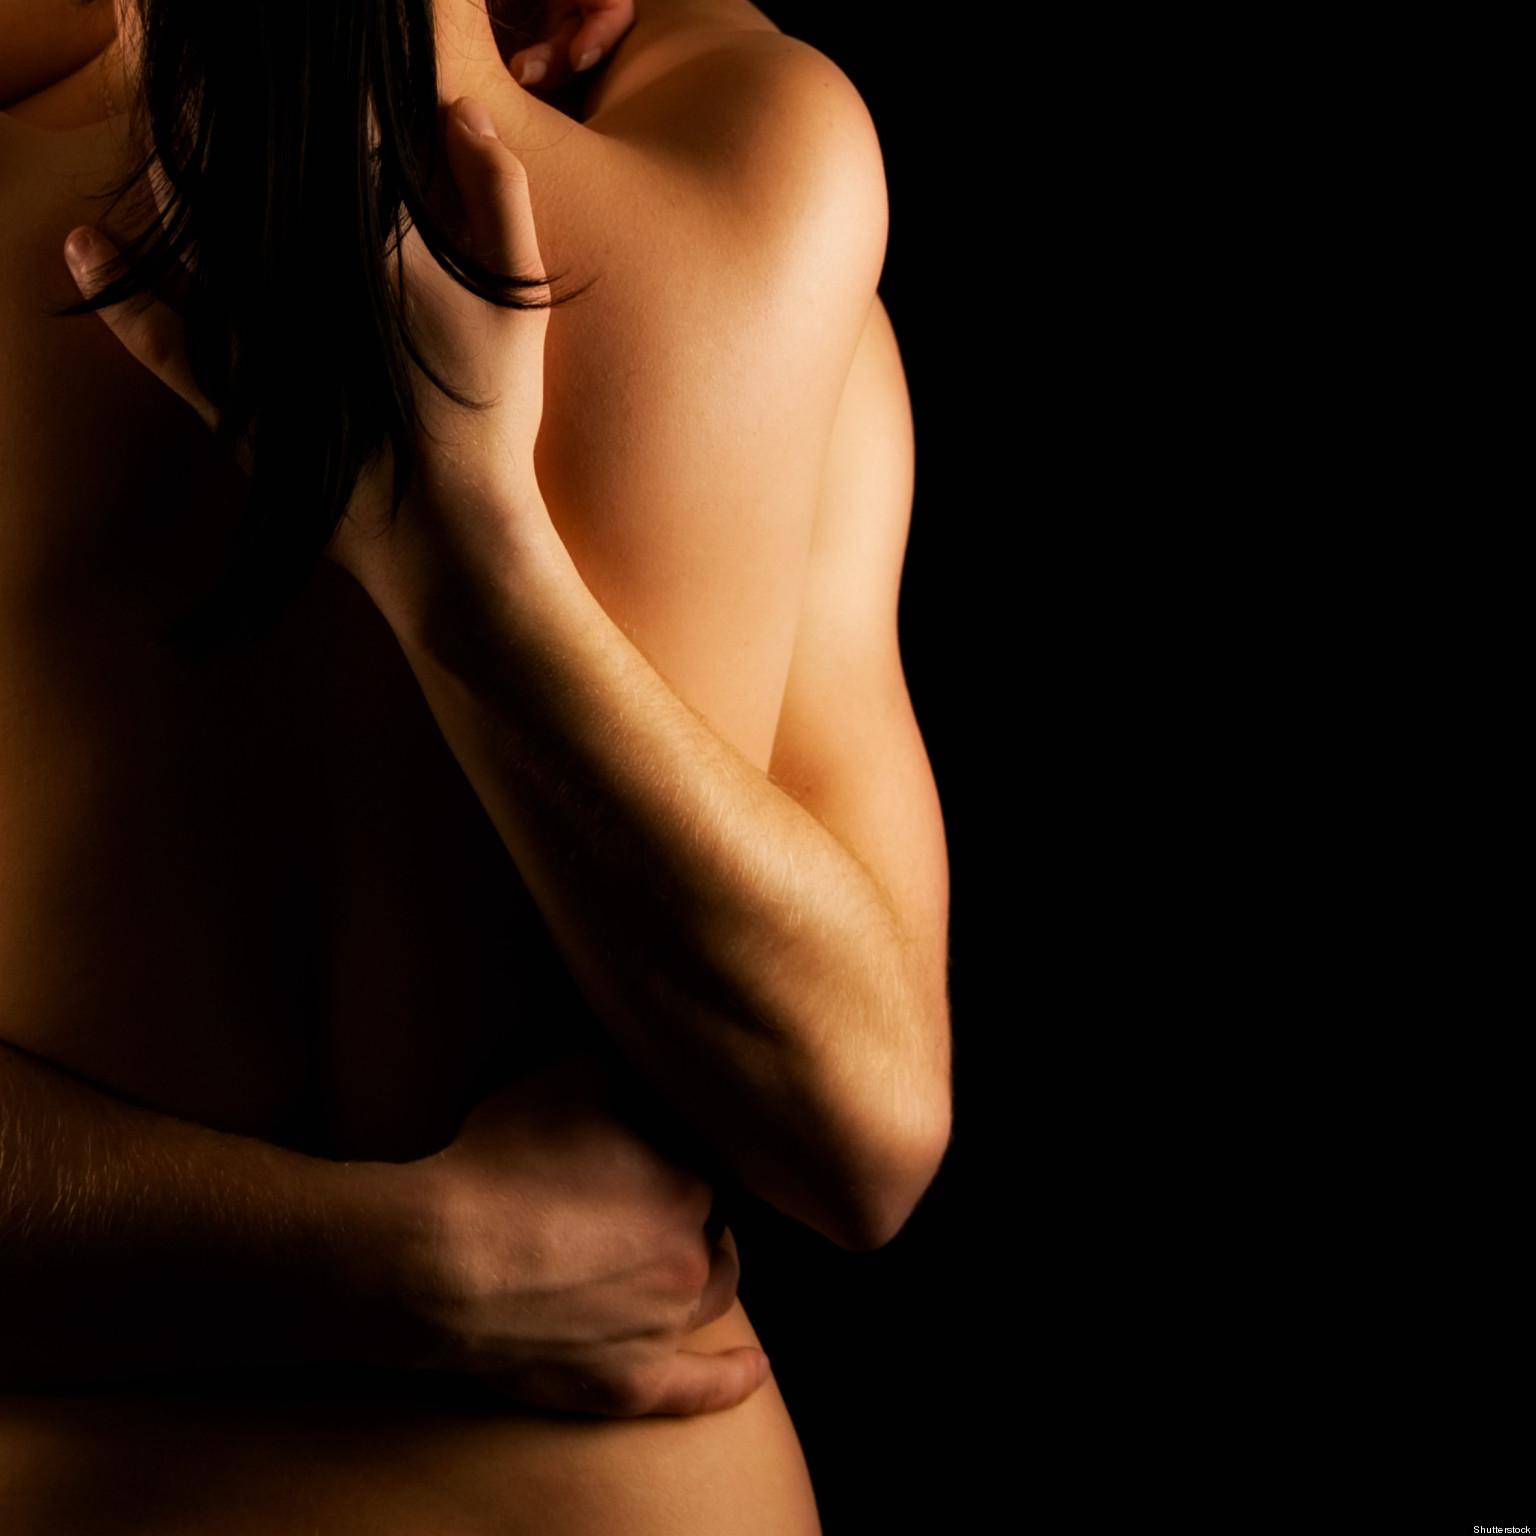 Тела секси прикосновения 8 фотография